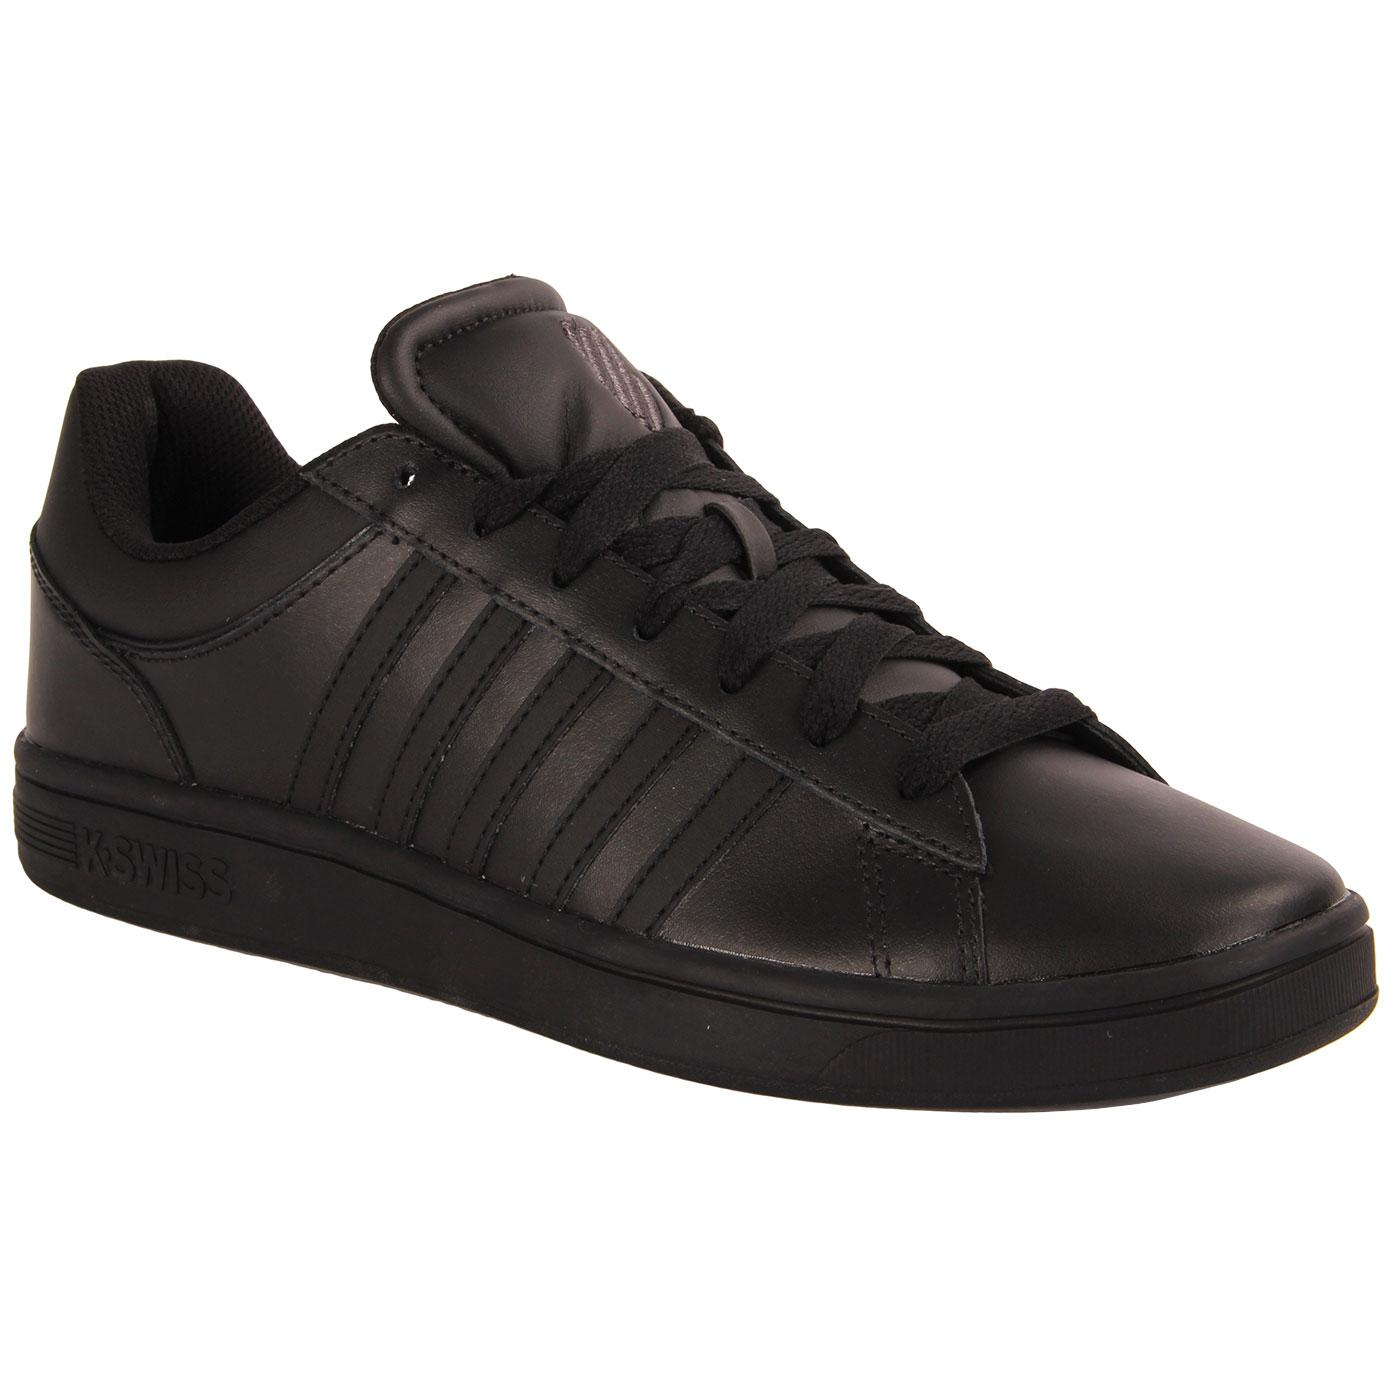 Court Winston K-SWISS Retro Trainers (Black/Black)